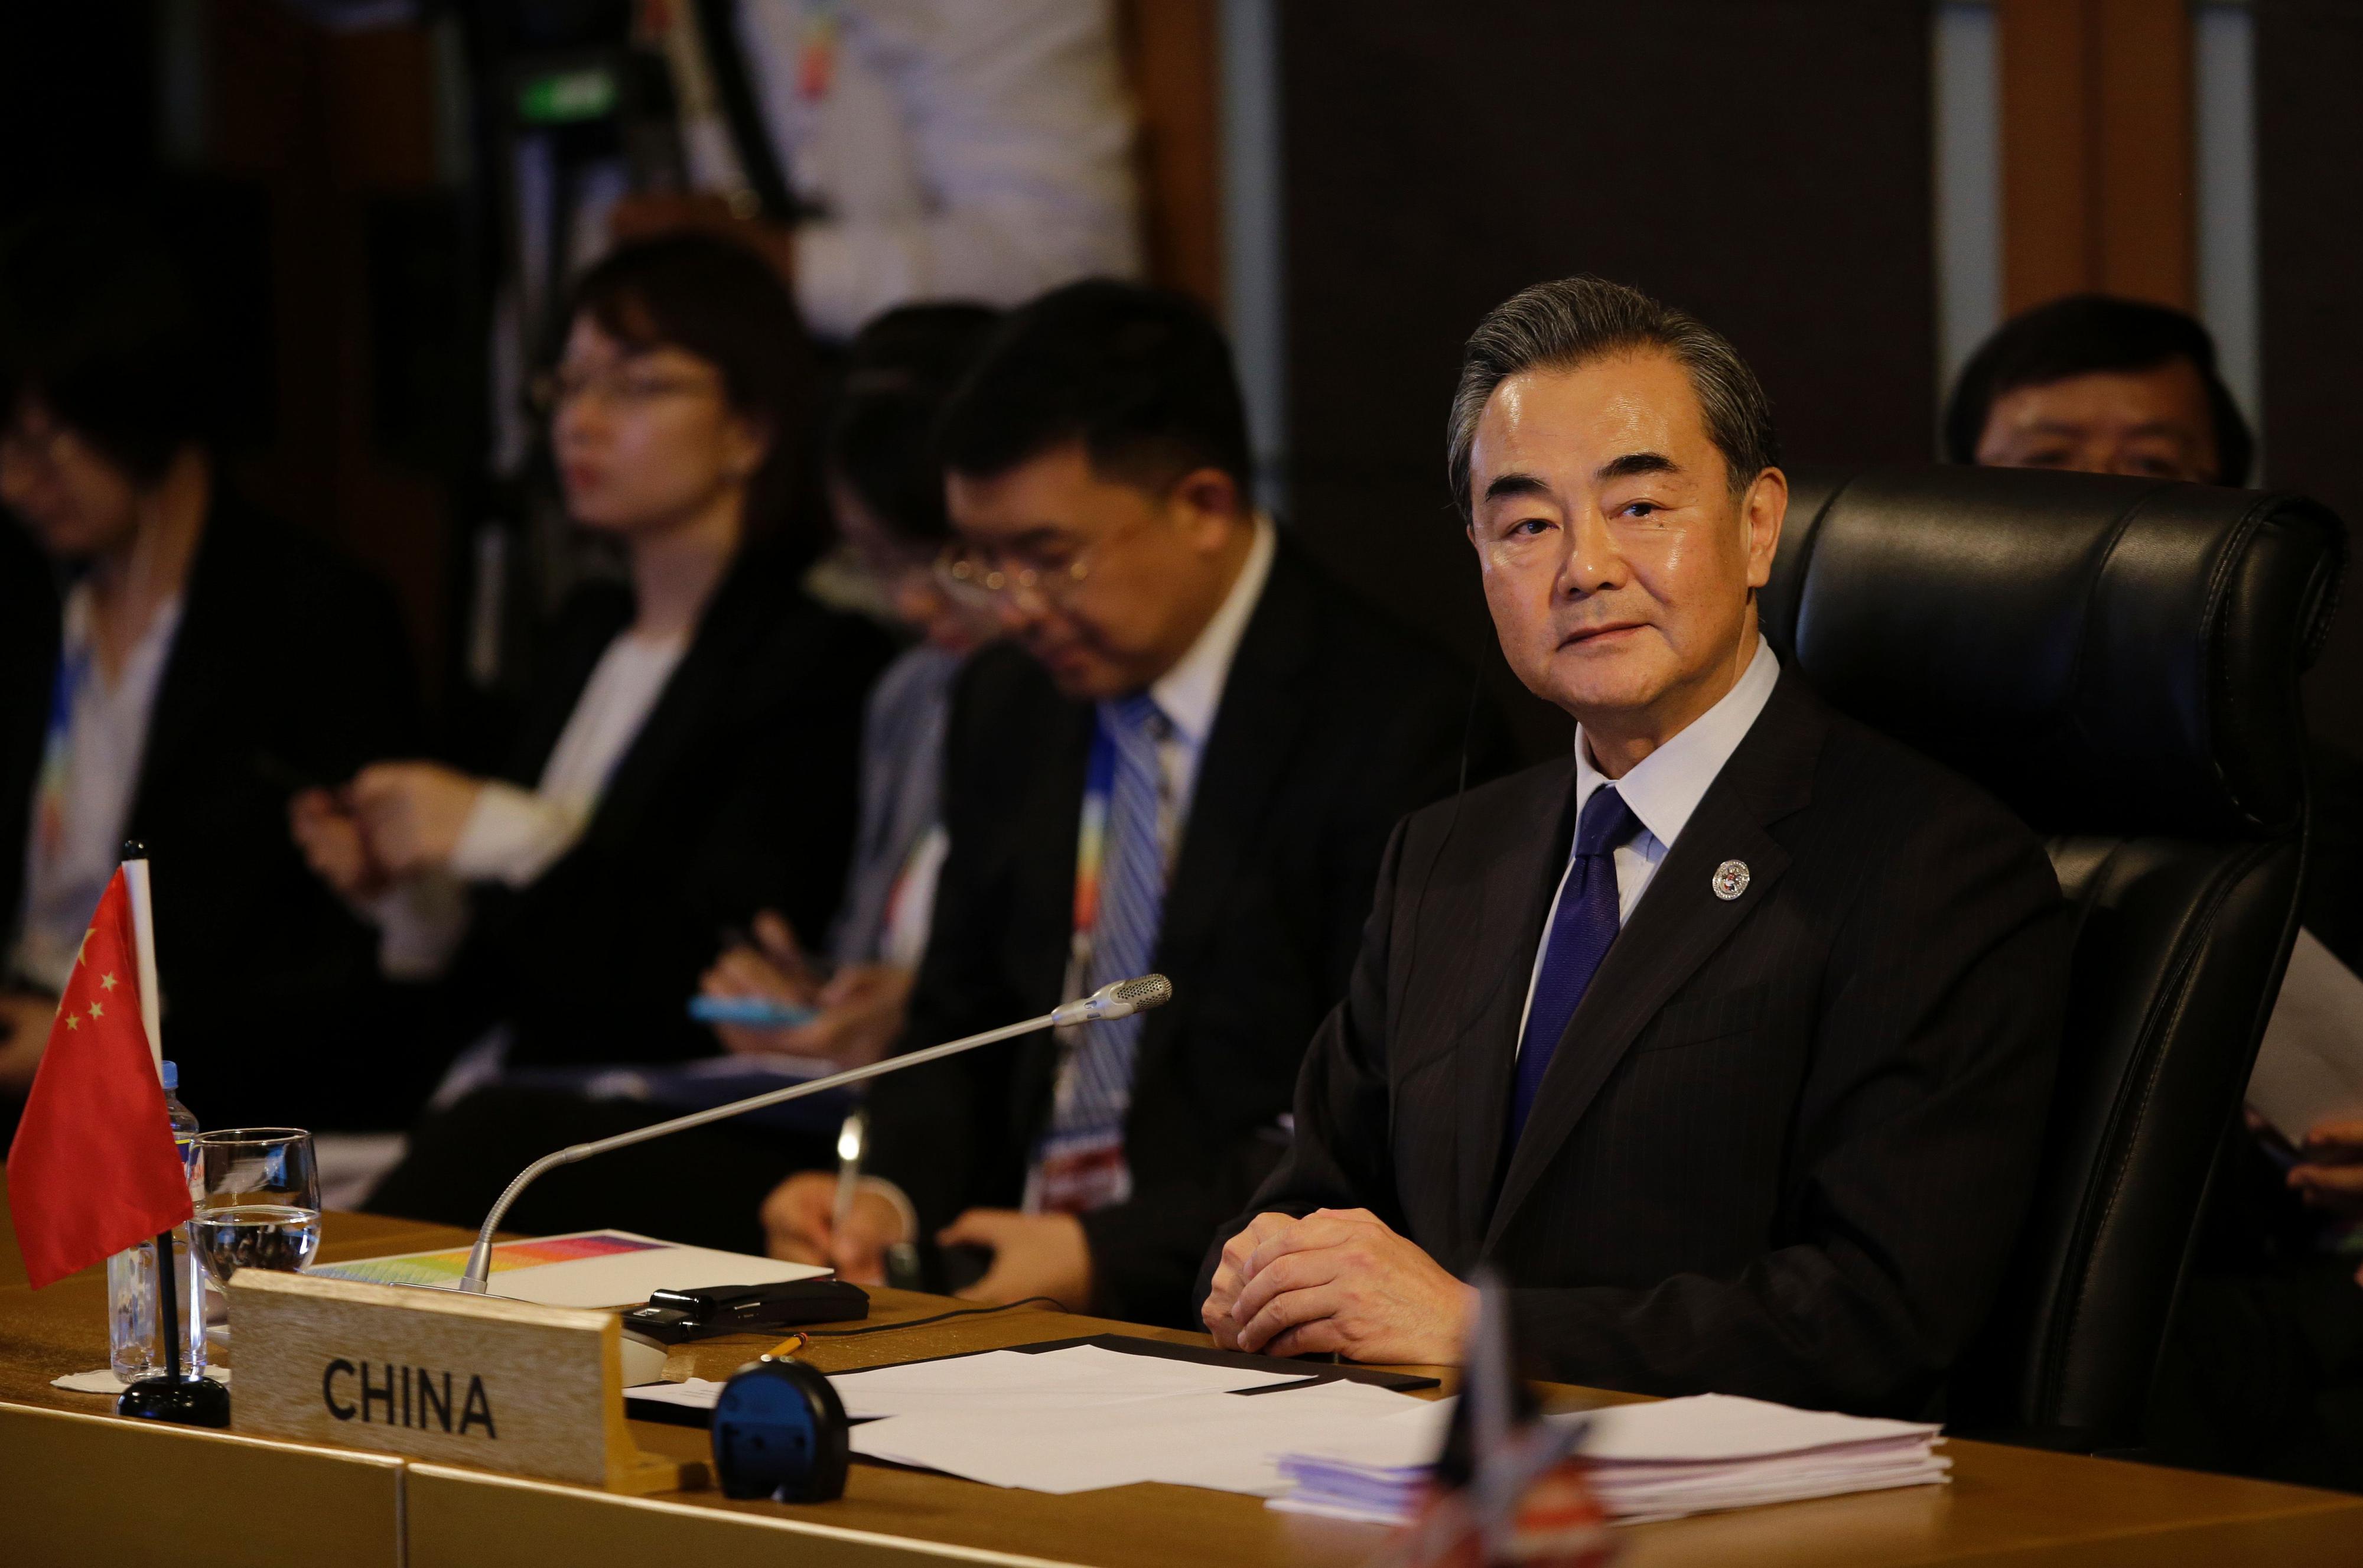 De Chinese minister van Buitenlandse Zaken, Wang Yi. Foto: AFP / Aaron Favila